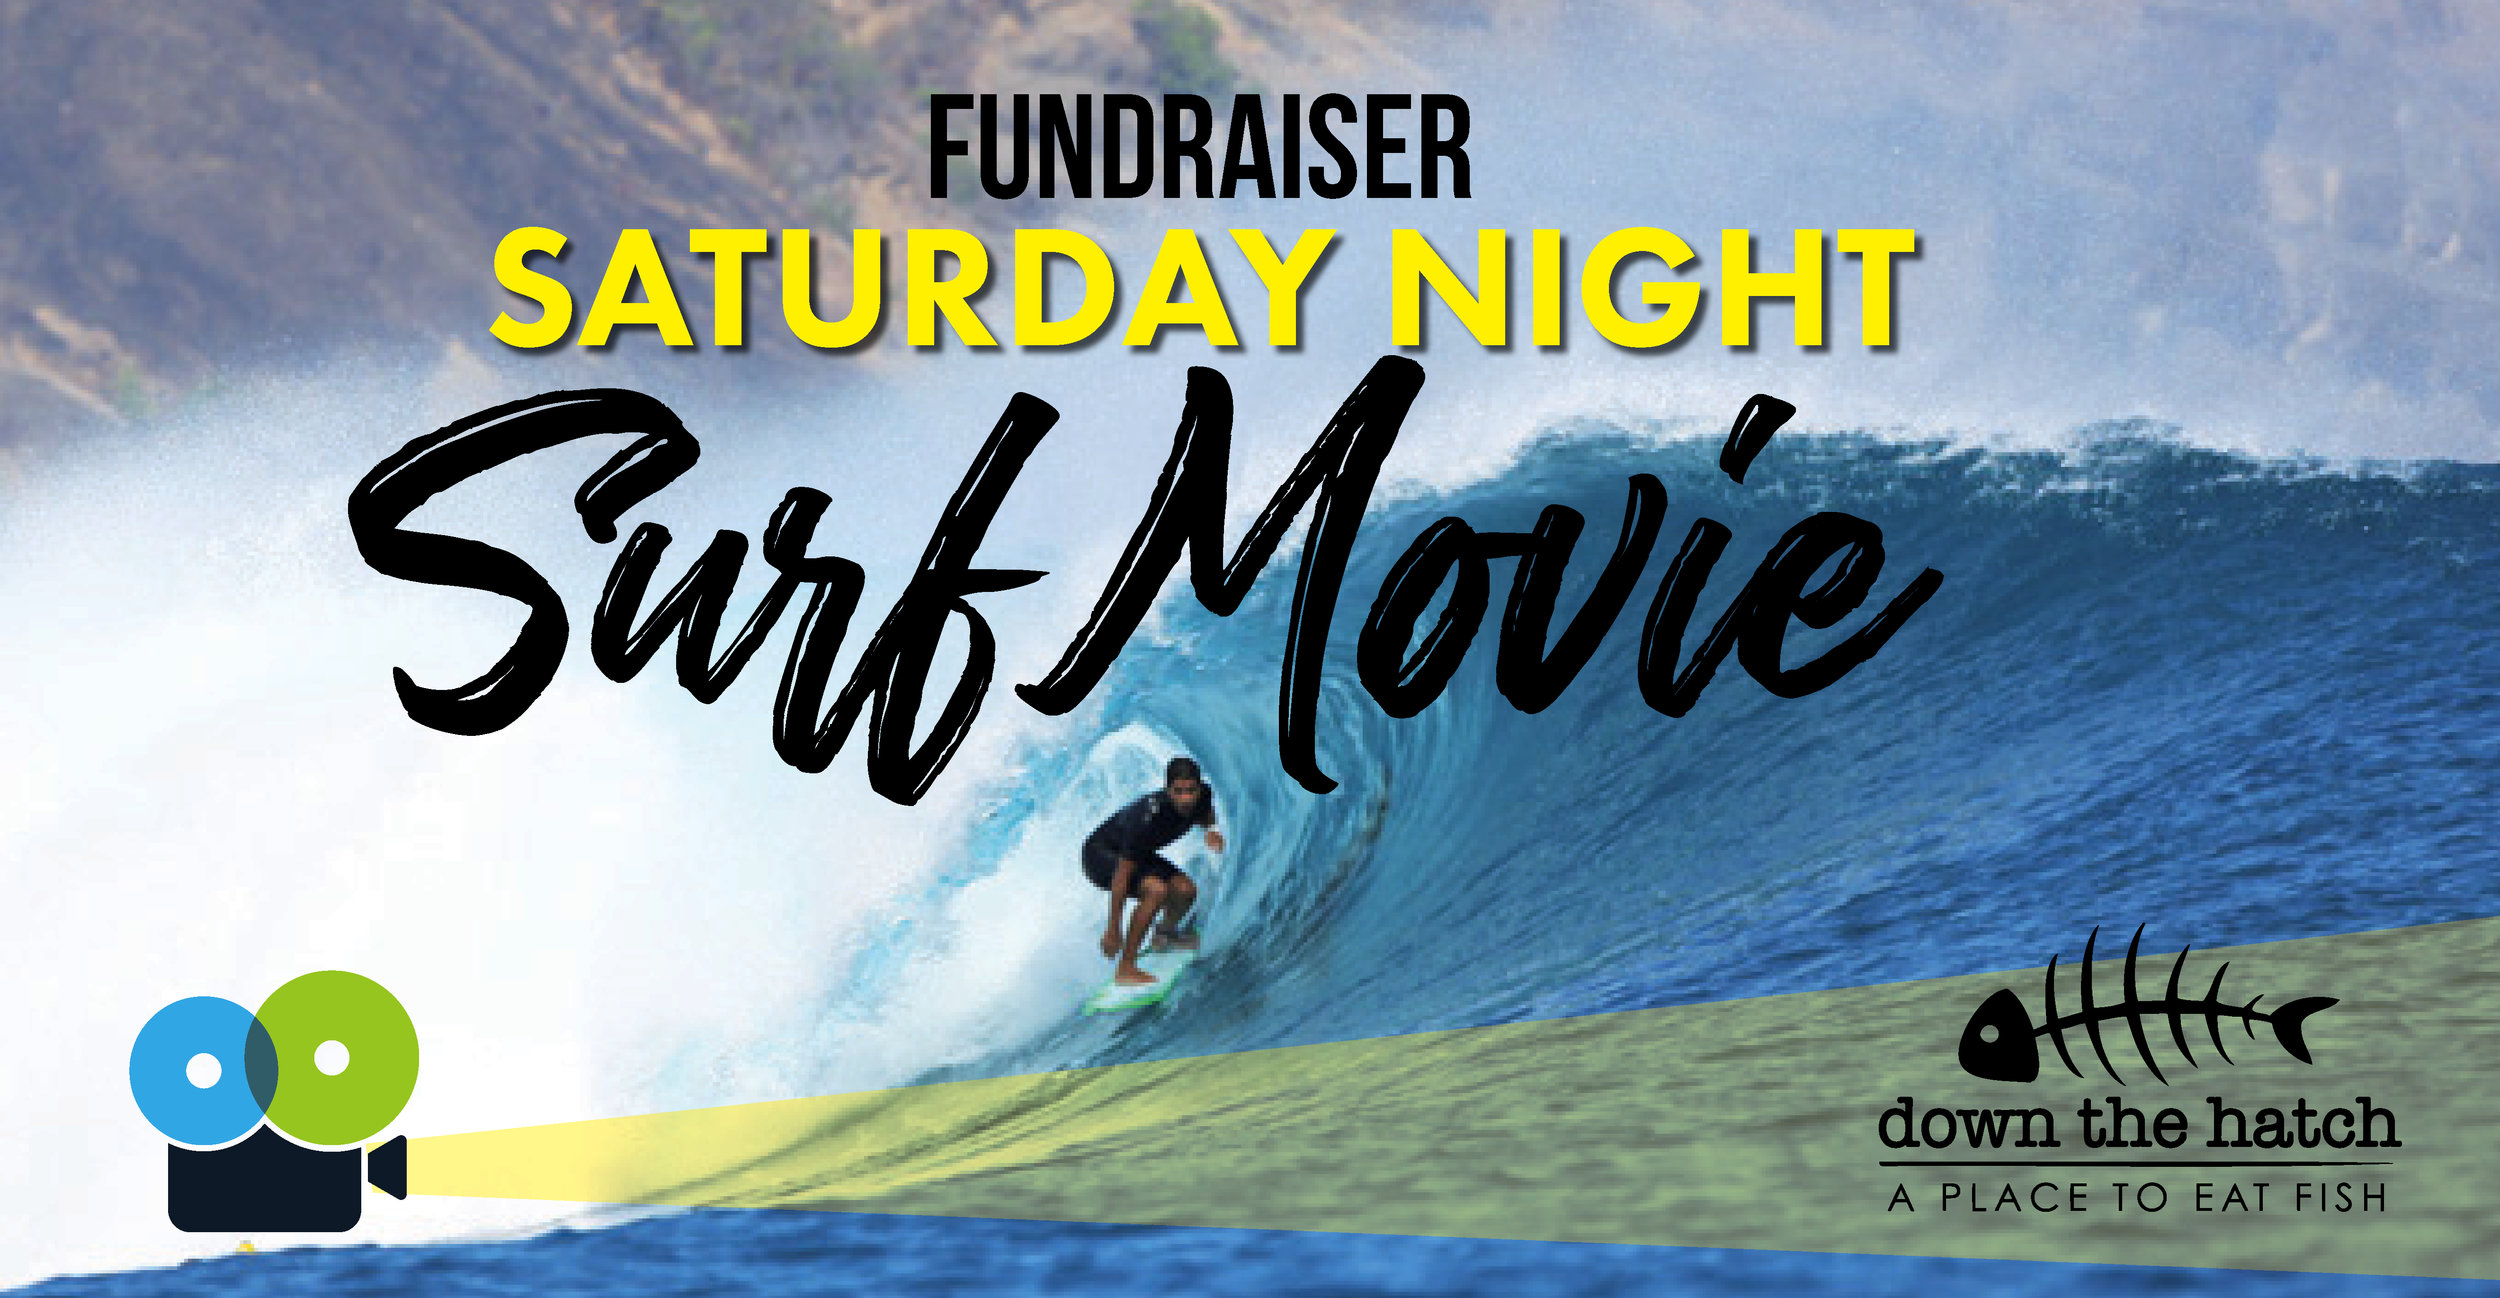 06-10 DTH SATURDAY NIGHT SURF MOVIE FACEBOOK.jpg